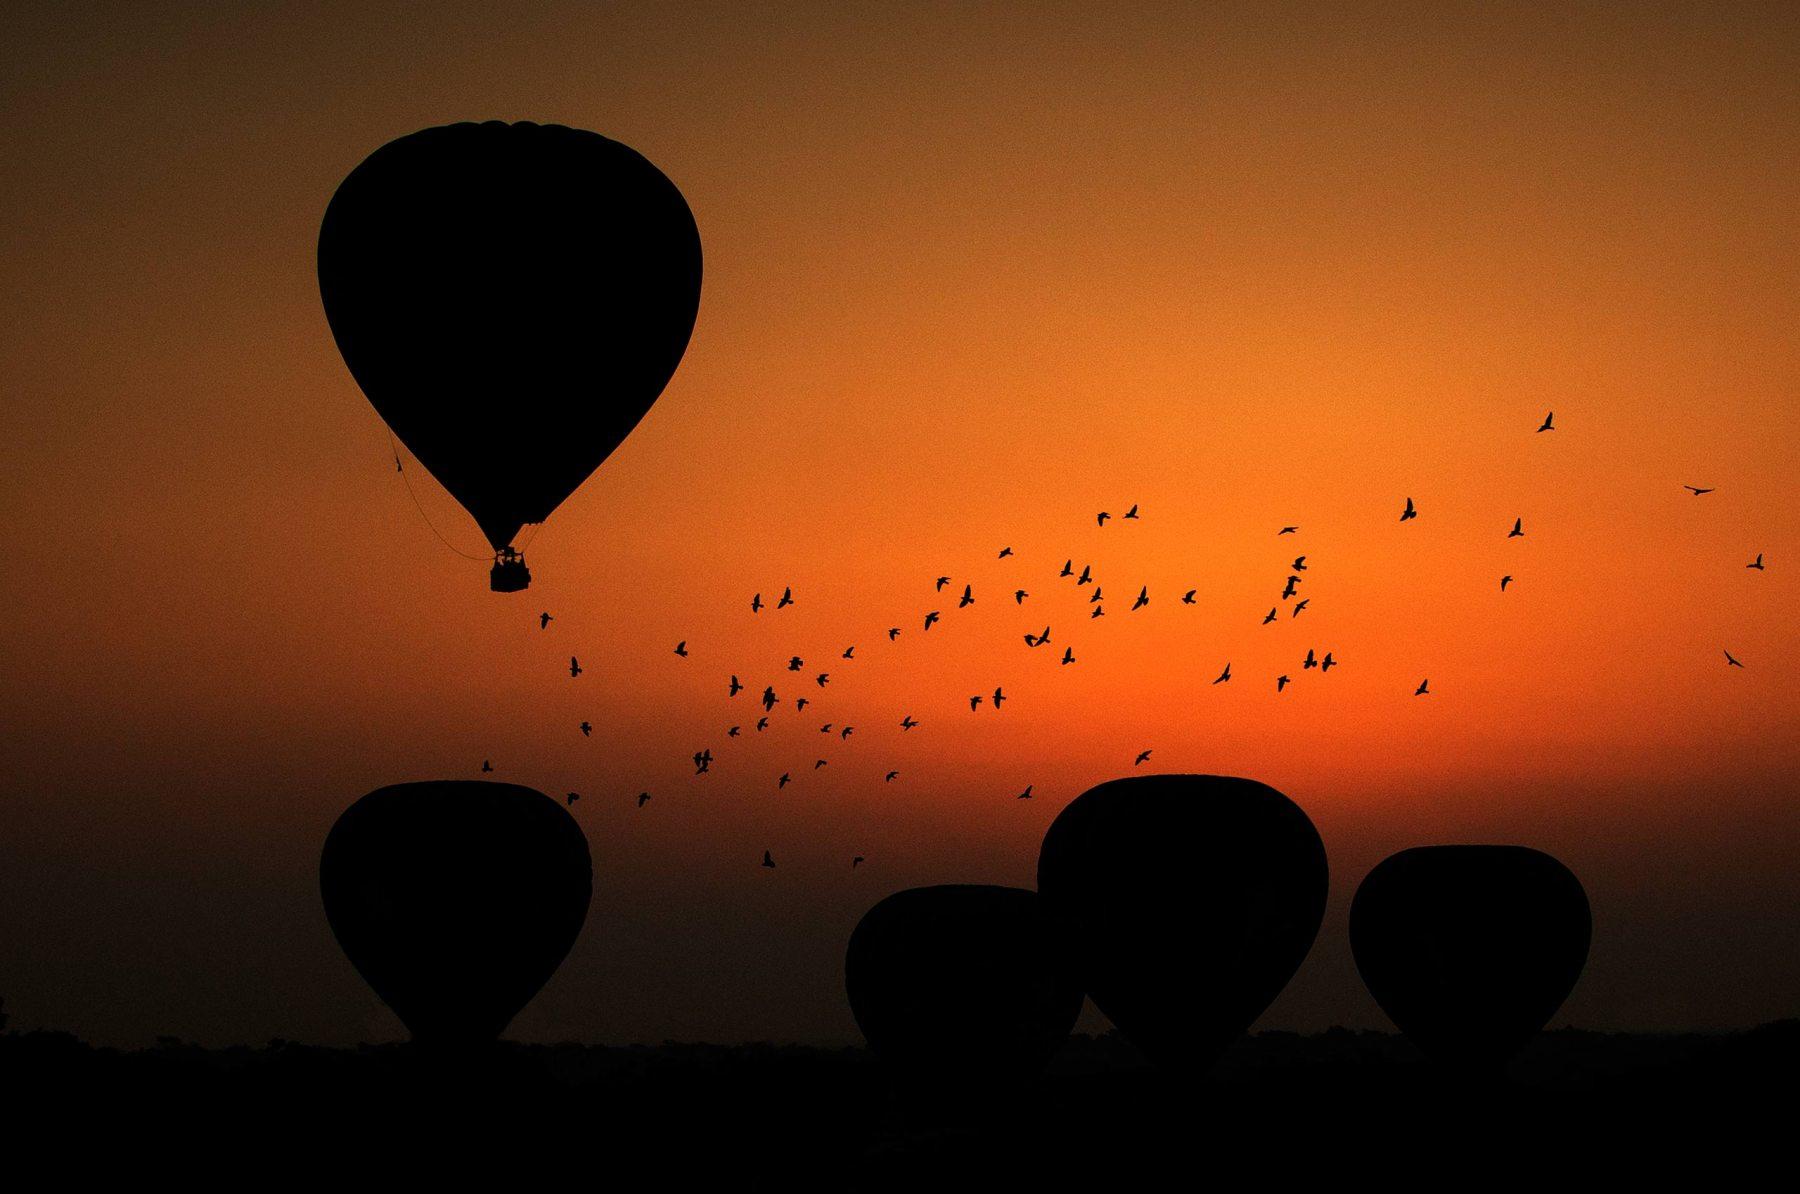 Balloons-Over-Bagan